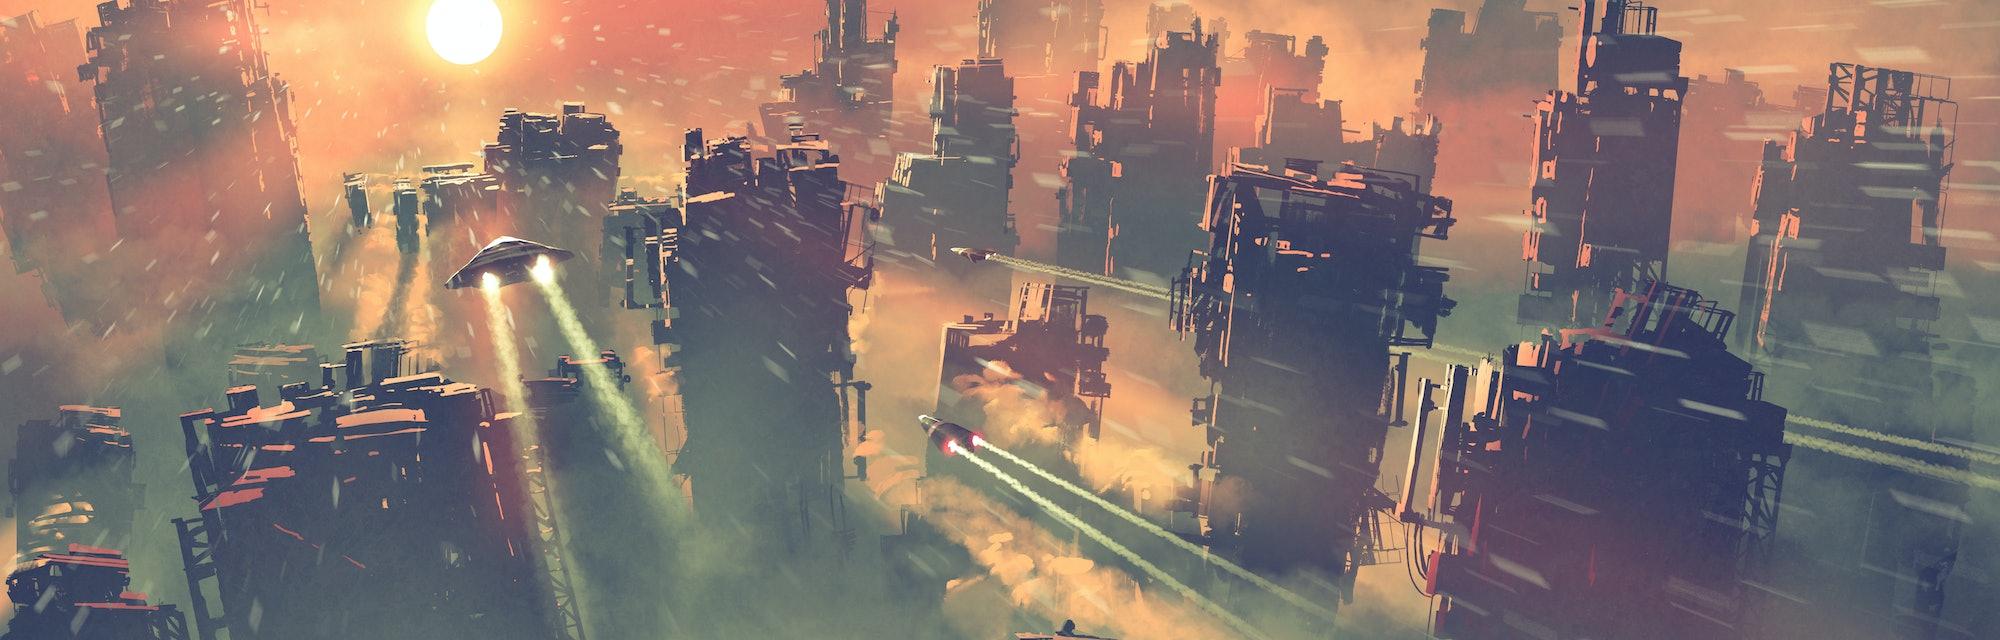 post apocalypse scenery showing of spaceships flying above abandoned skyscrapers, digital art style,...